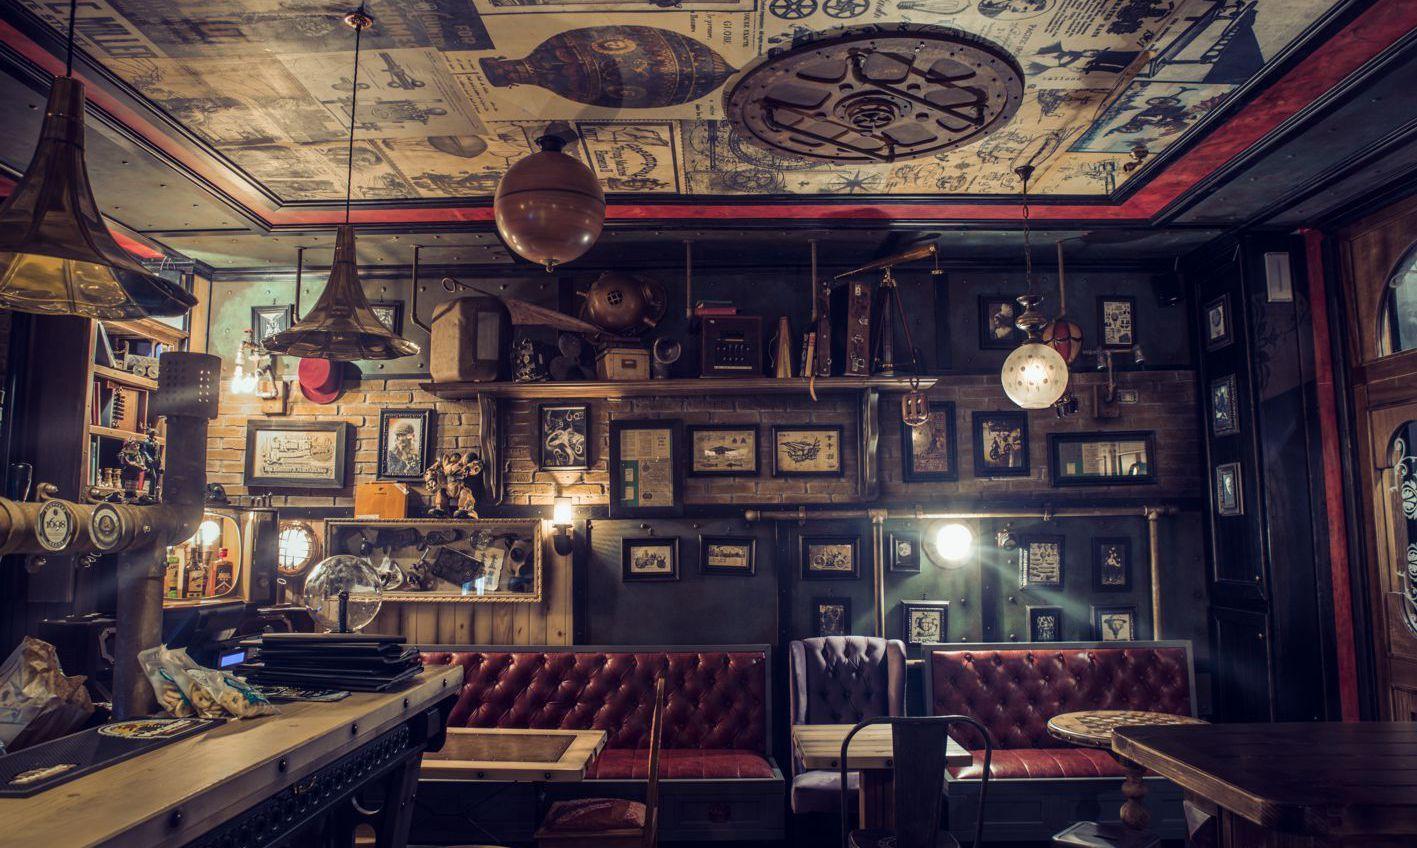 Arredamento birreria ~ Camproject srl. arredo pub arredamenti arredi per irish pub